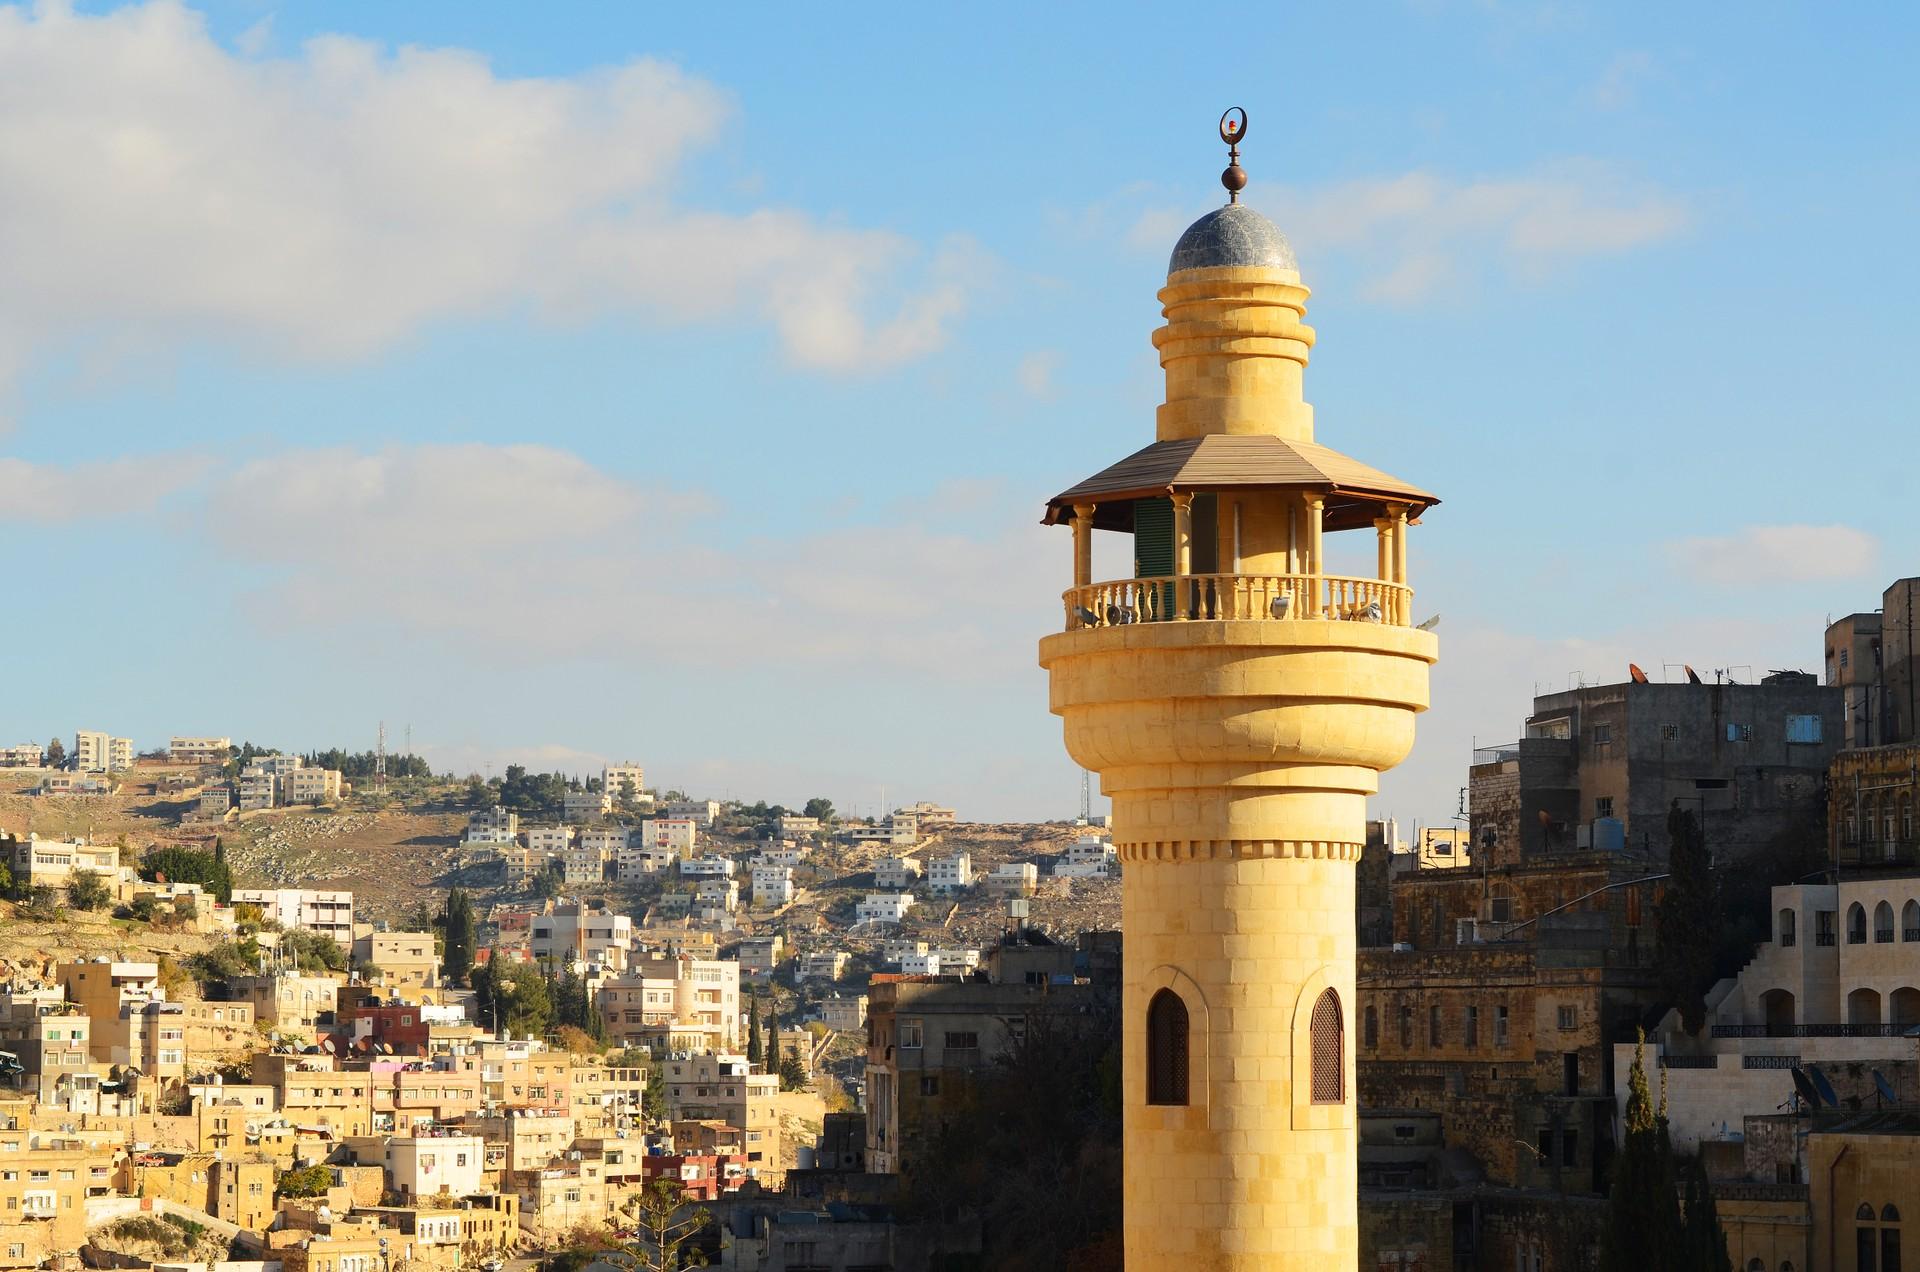 the minaret of Salt in Jordan